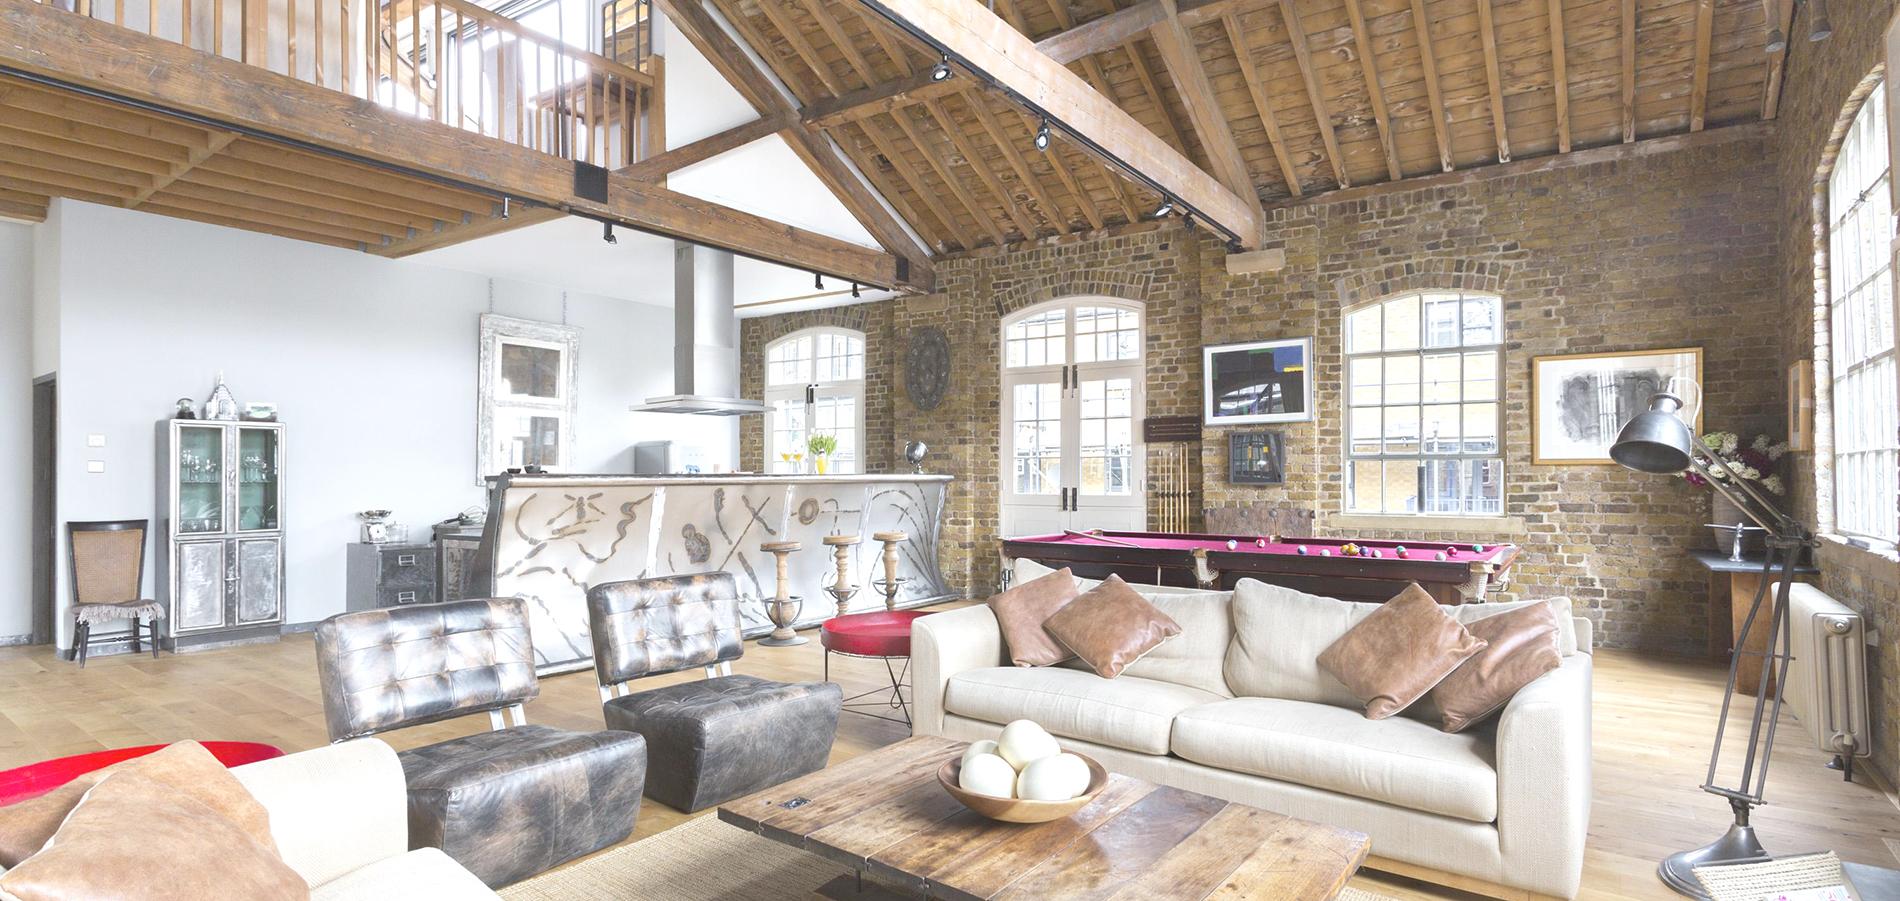 transformation maison ann es 50. Black Bedroom Furniture Sets. Home Design Ideas